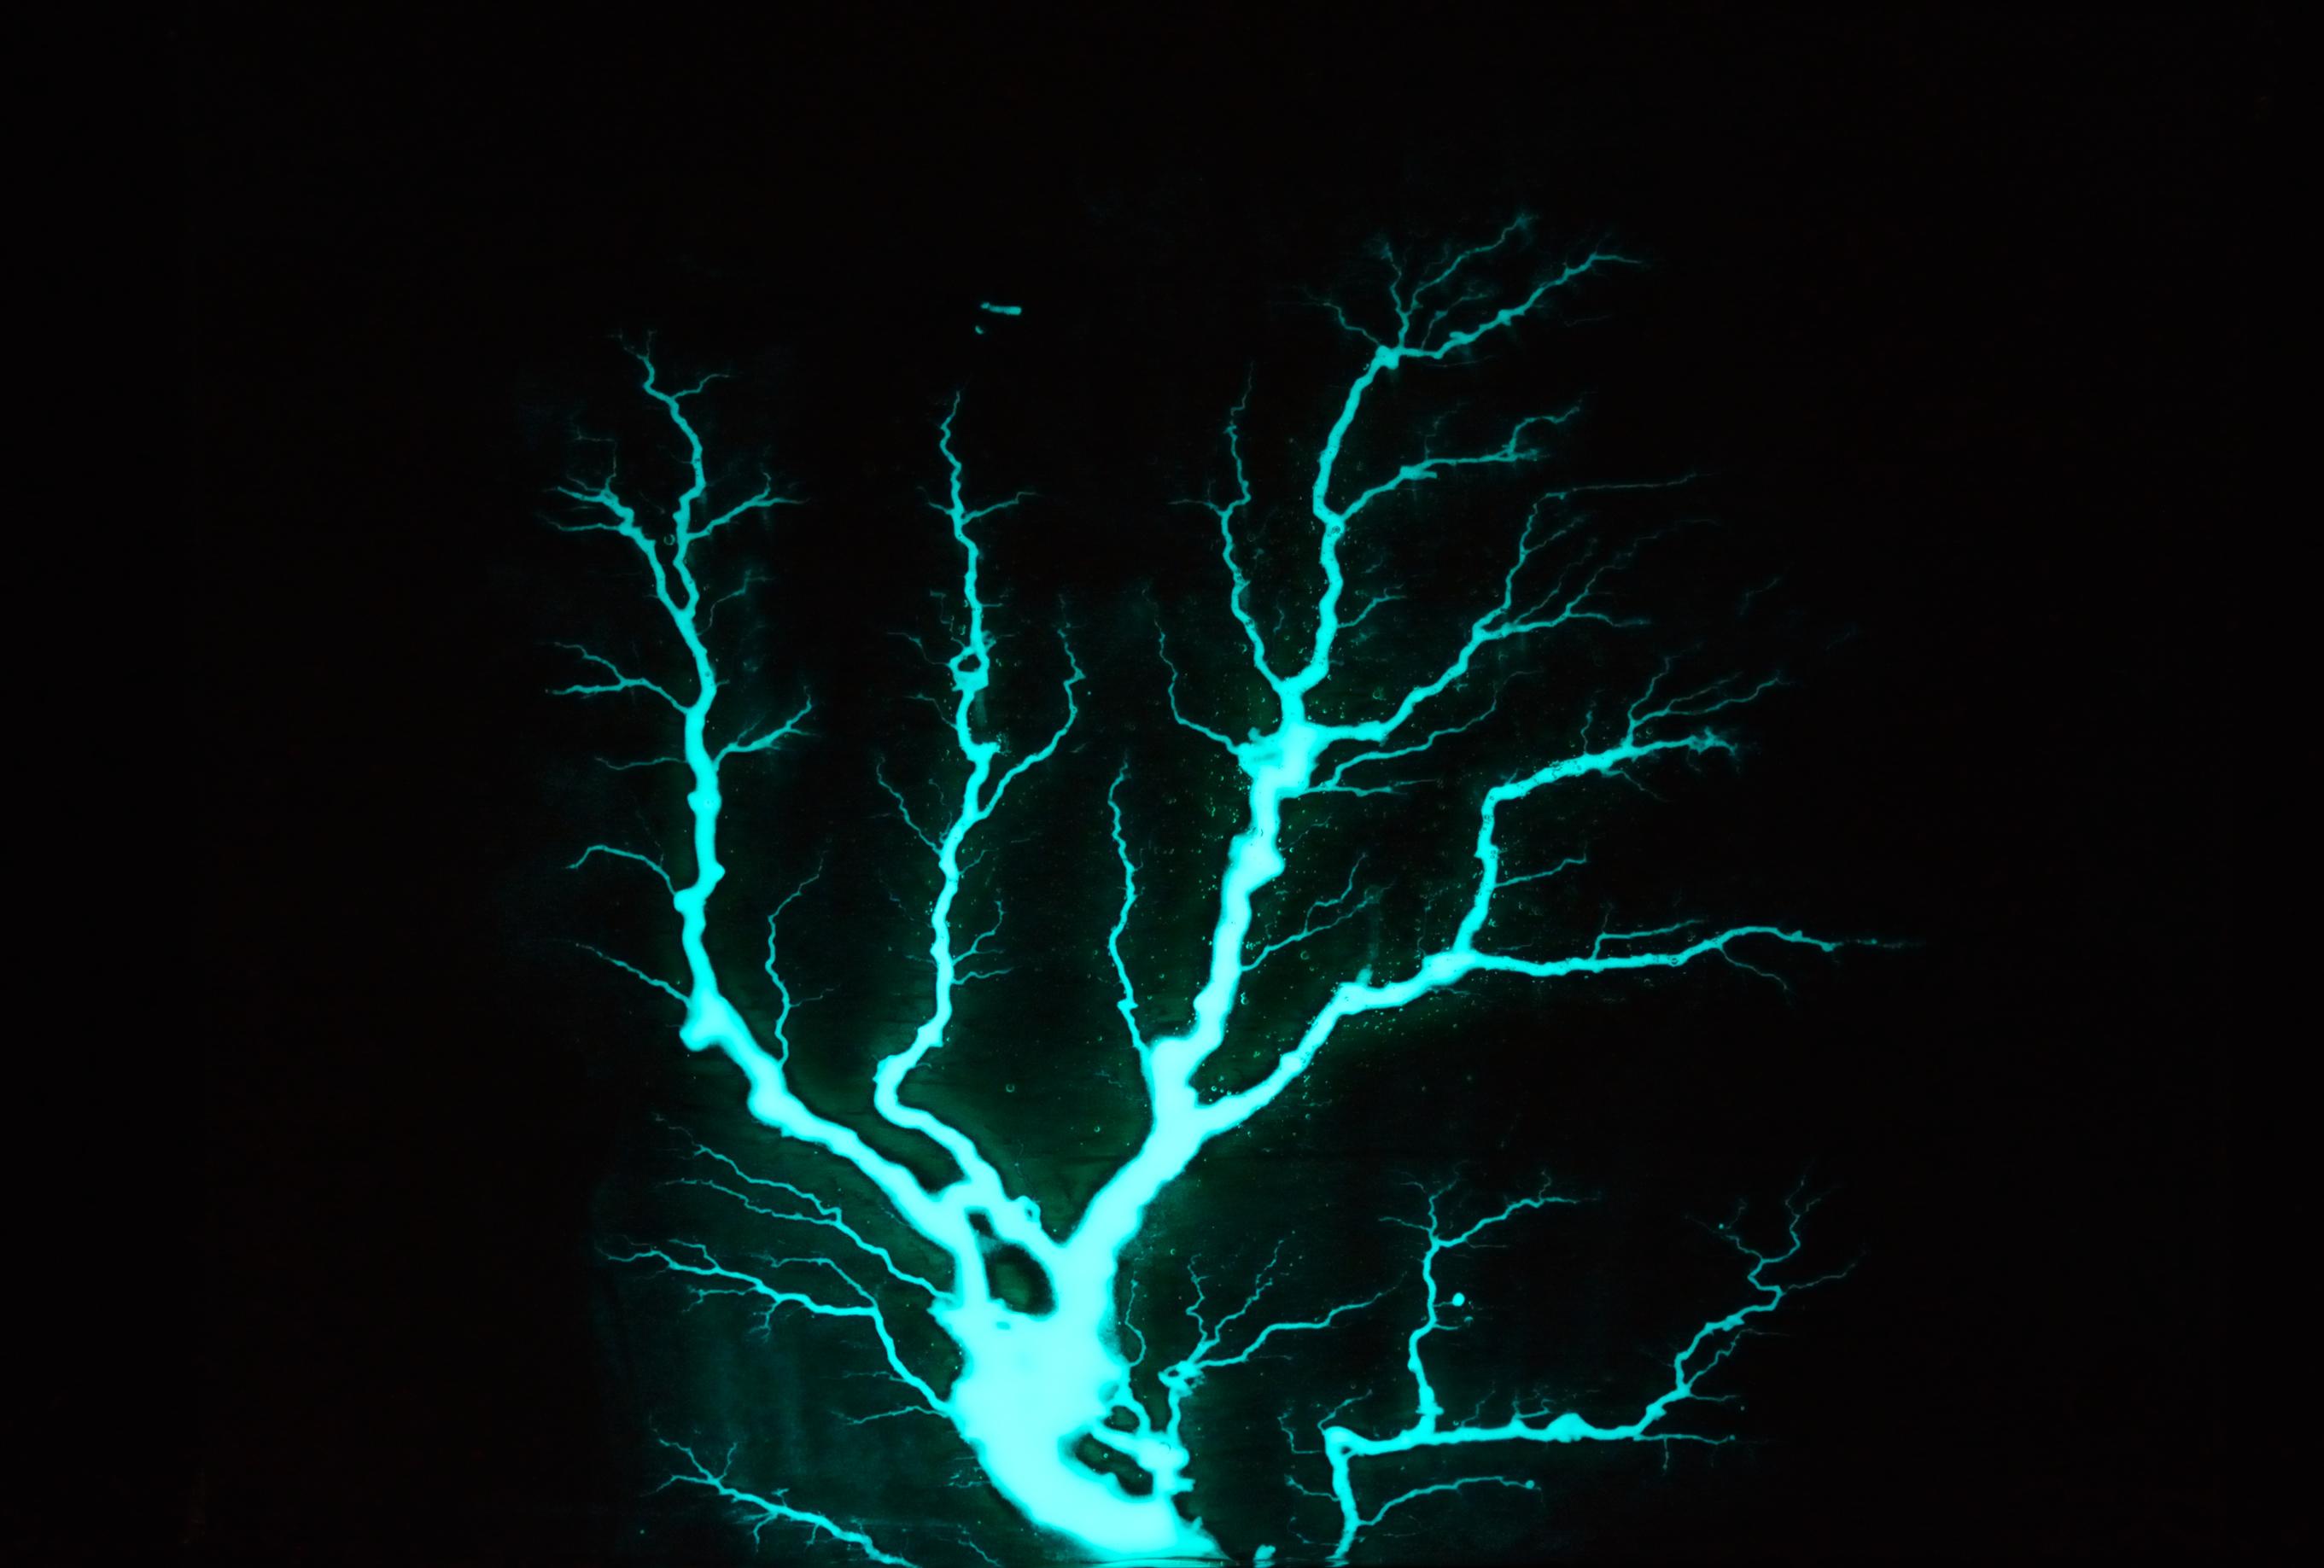 Ambrosia Maple Glow in the Dark